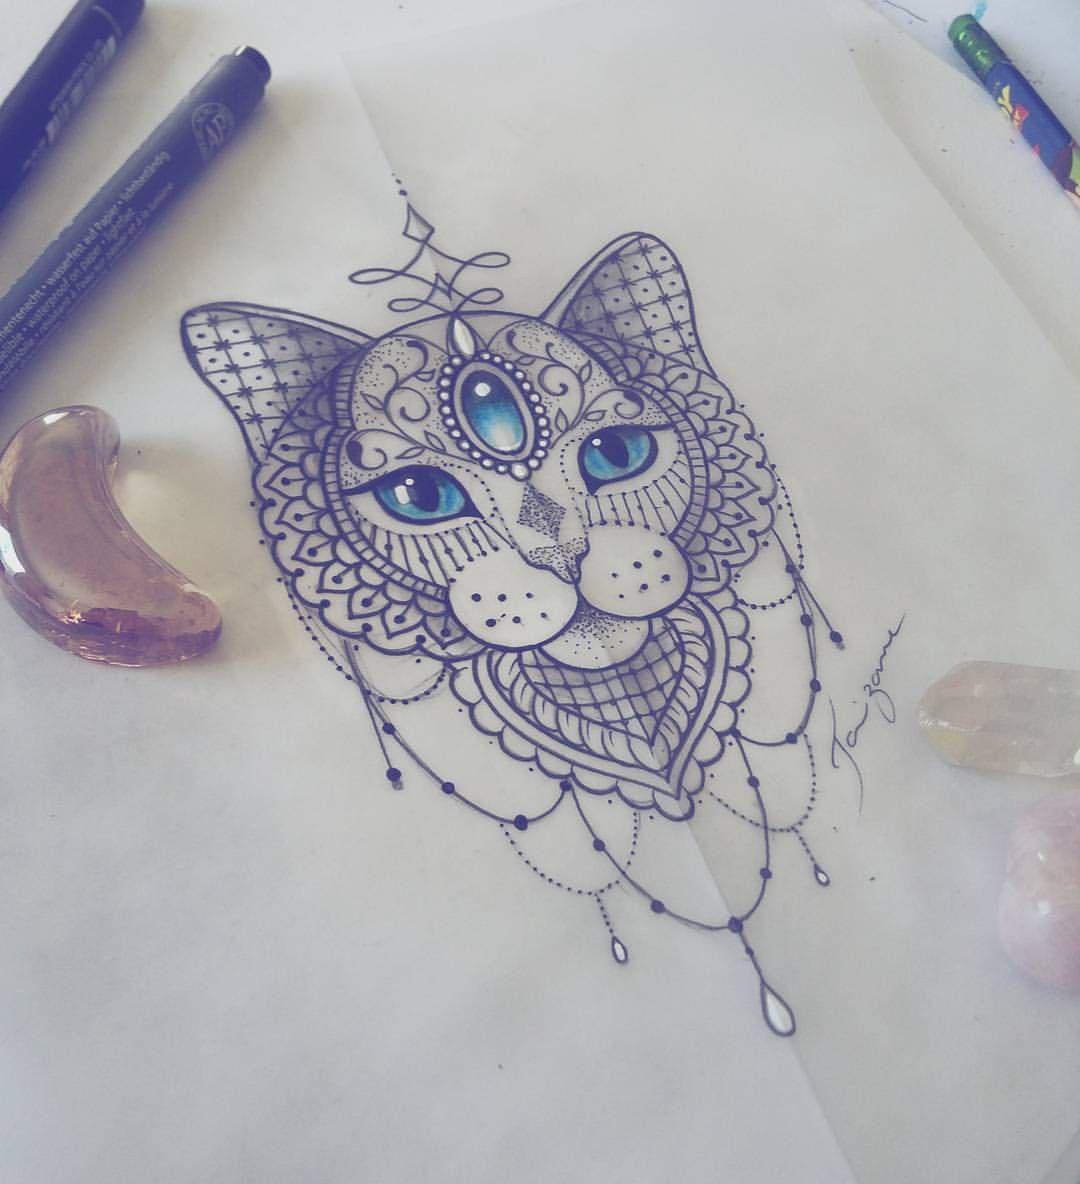 Animal in black and white with blue eye color | Tatuajes de gato ...